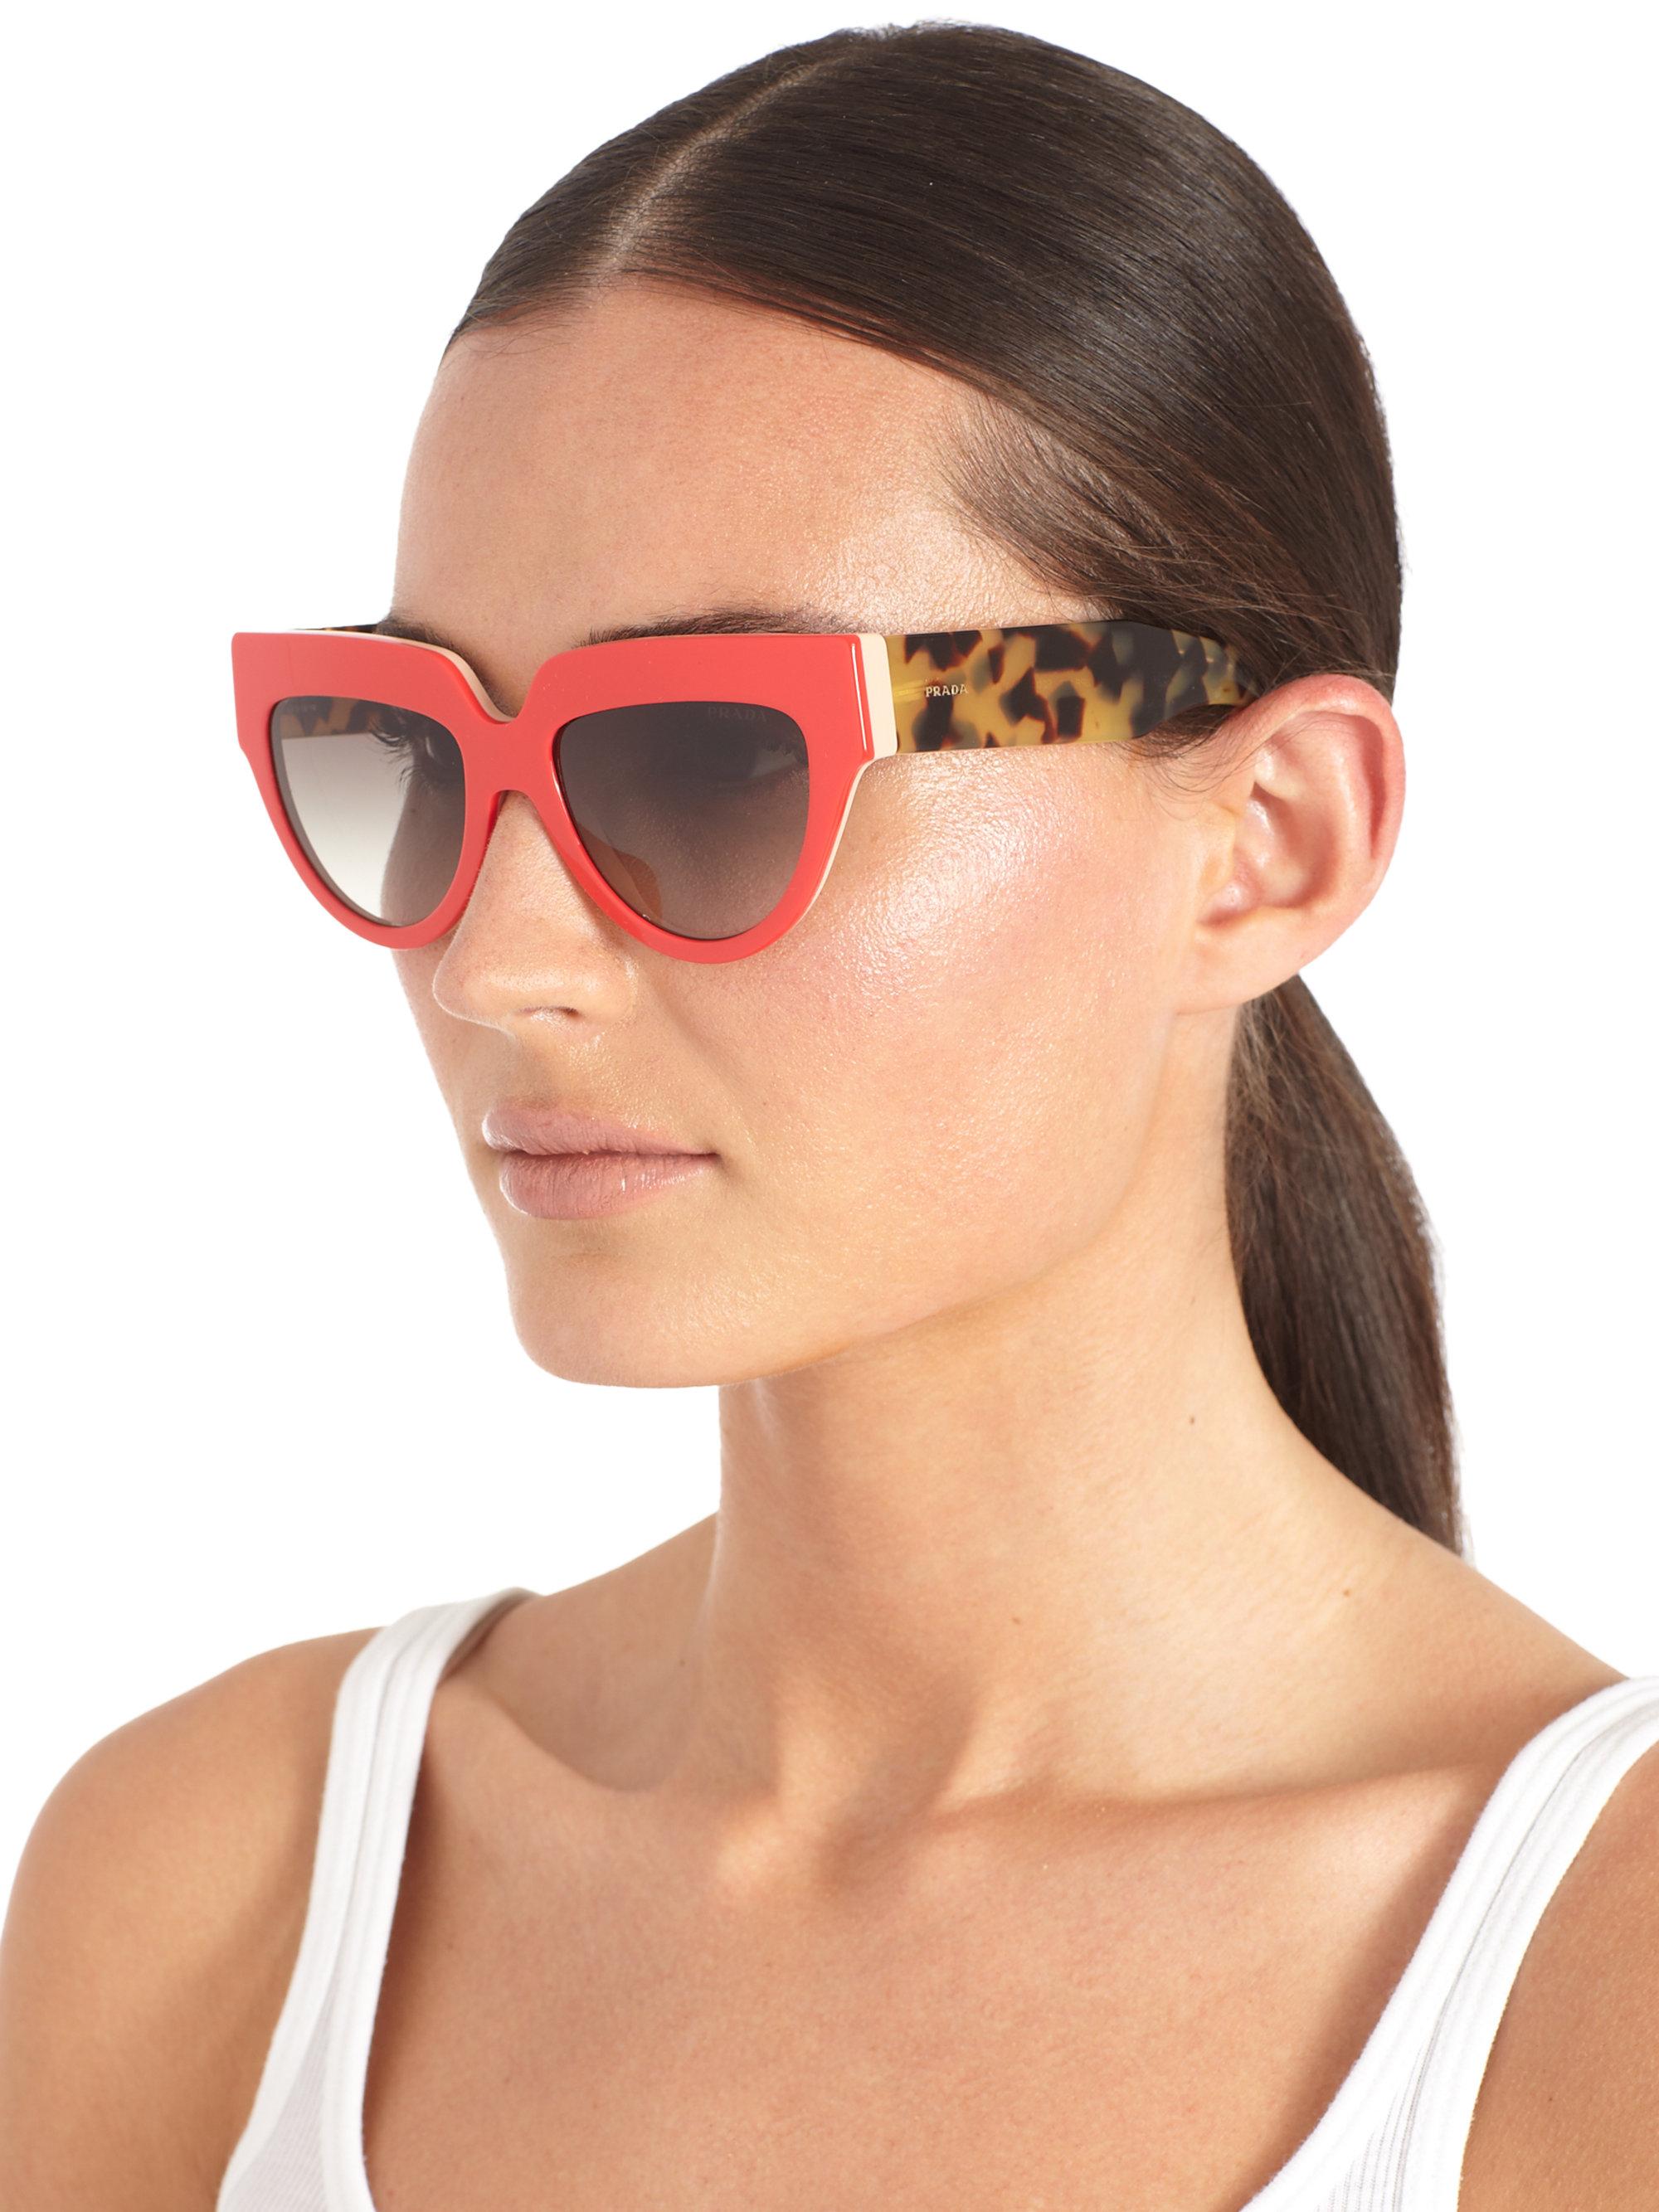 84efbeb8fd Lyst - Prada Poeme Plastic Sunglasses in Blue